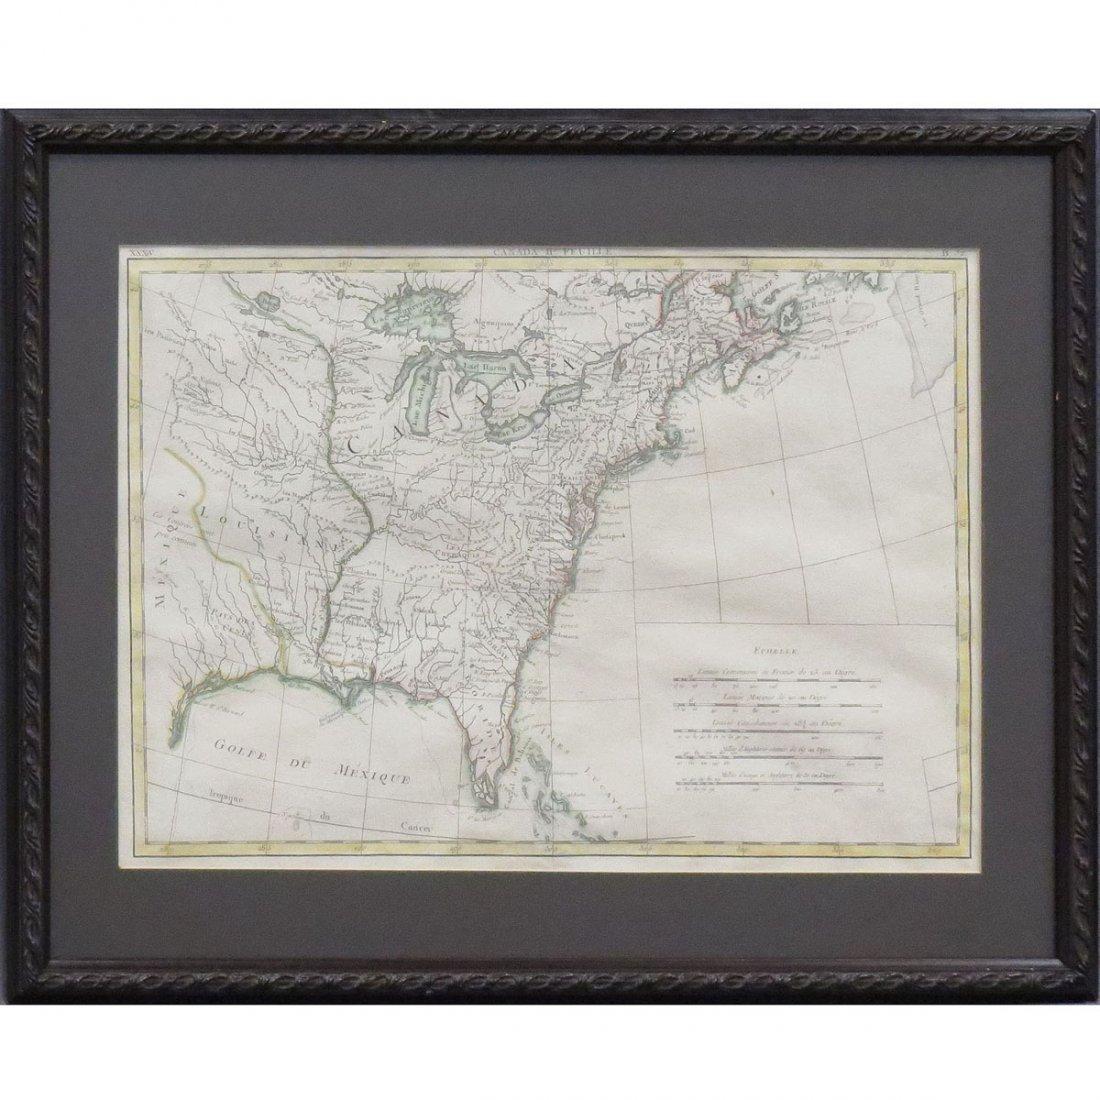 RIGOBERT BONNE, ENGRAVED MAP OF CANADA/EASTERN